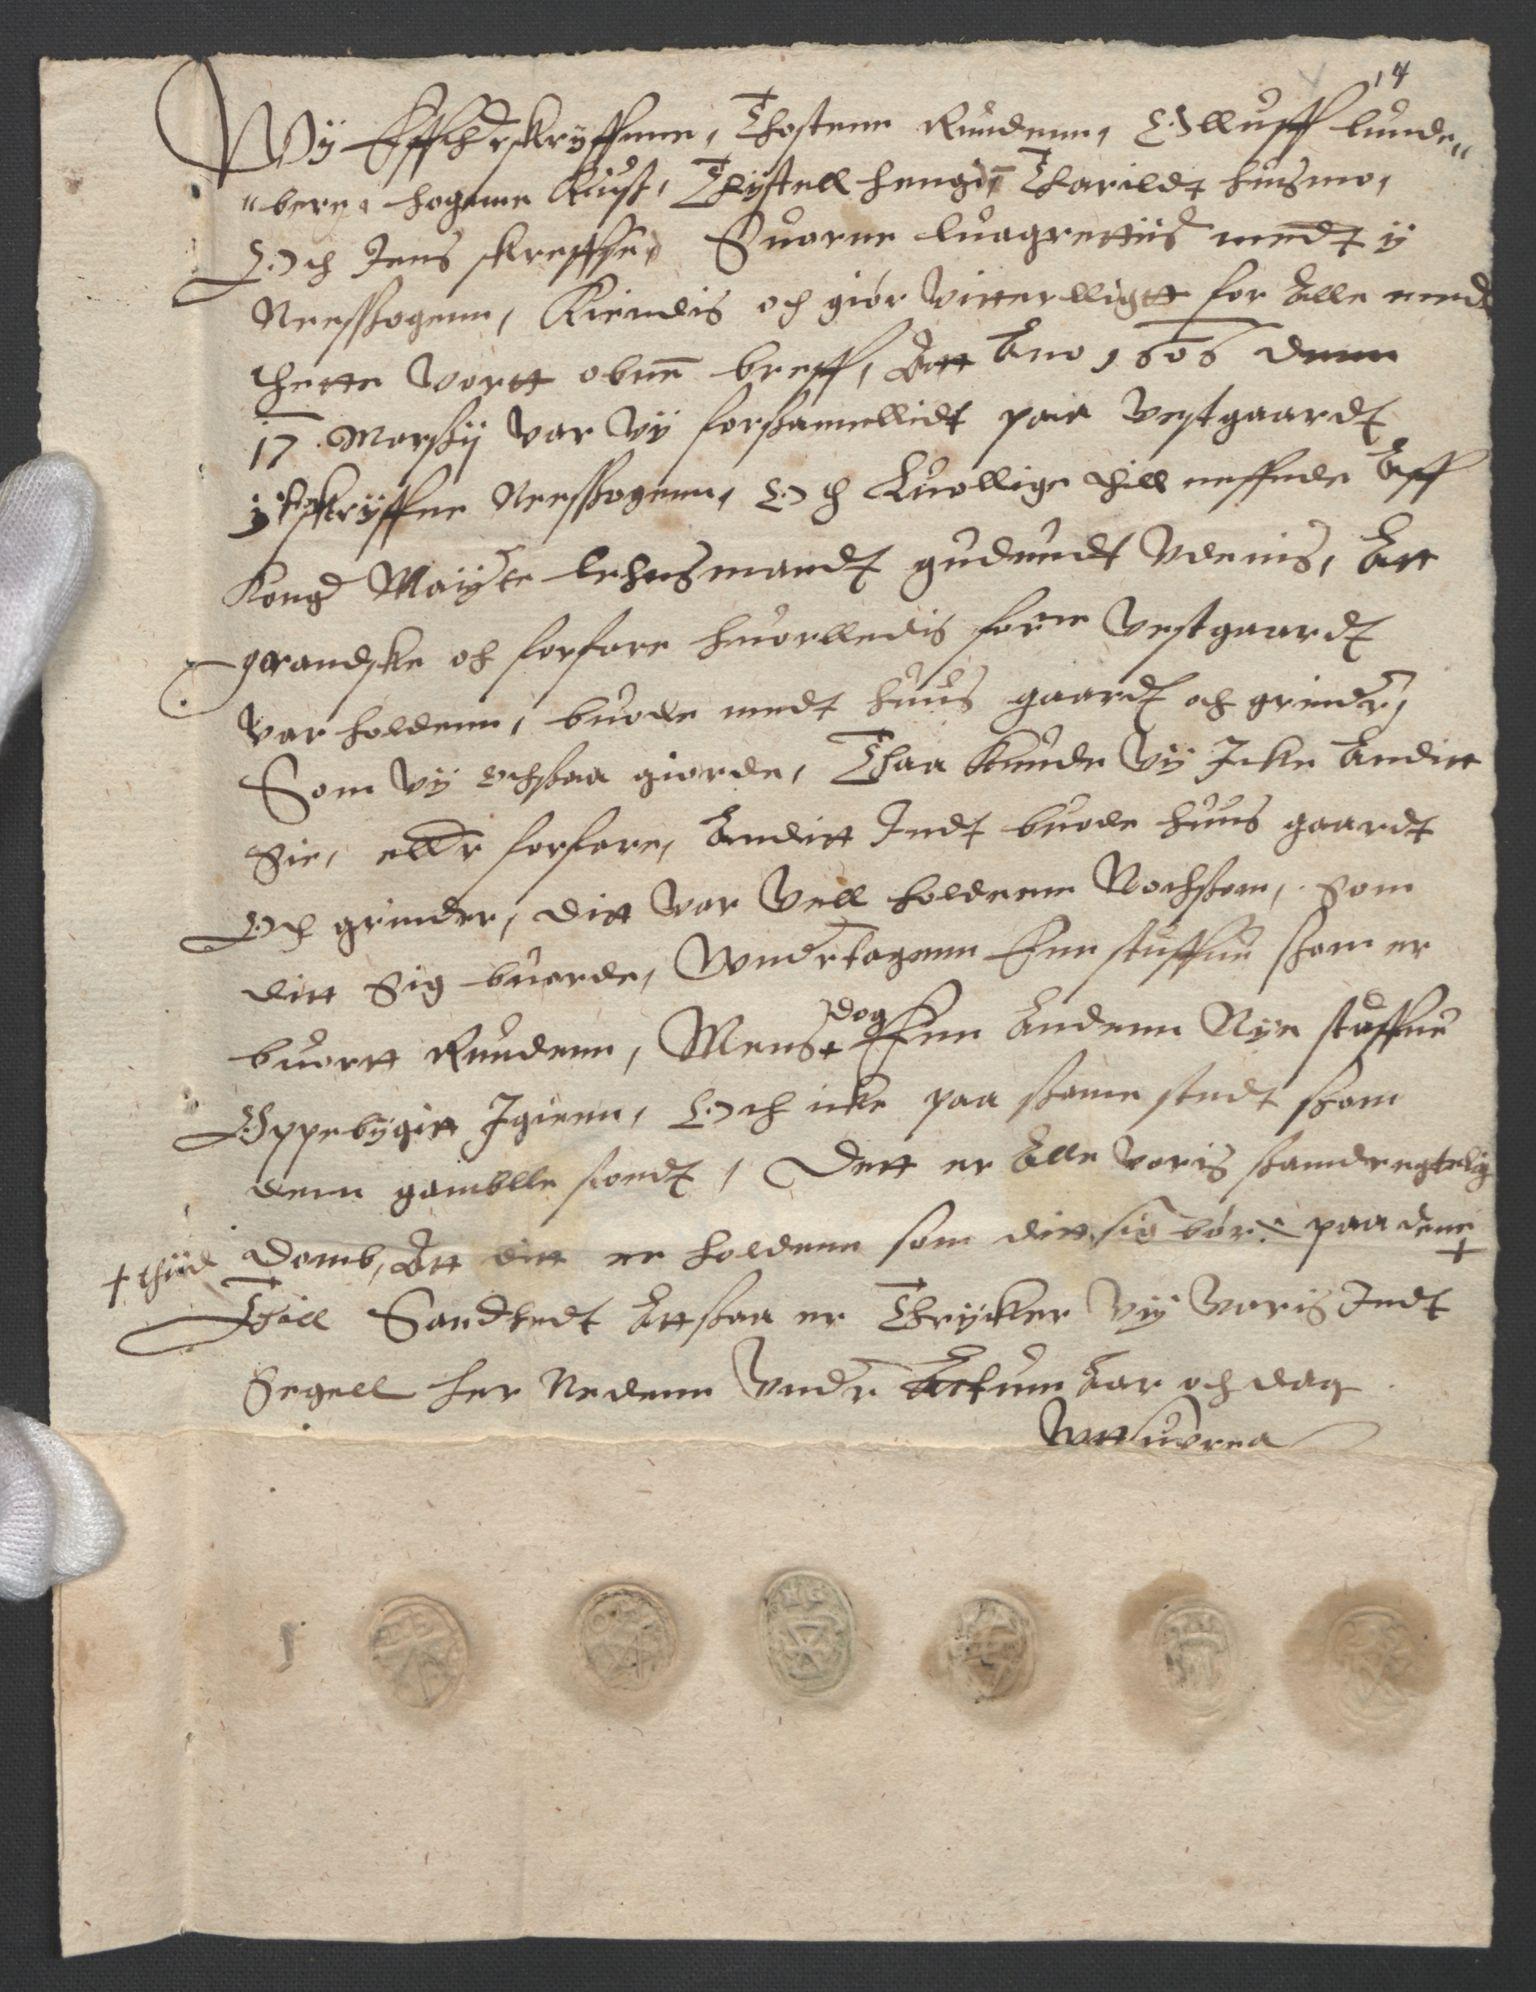 SAO, Oslo stiftsdireksjon, G/Gb/L0001: Bispestolens dokumenter, 1584-1612, s. 14